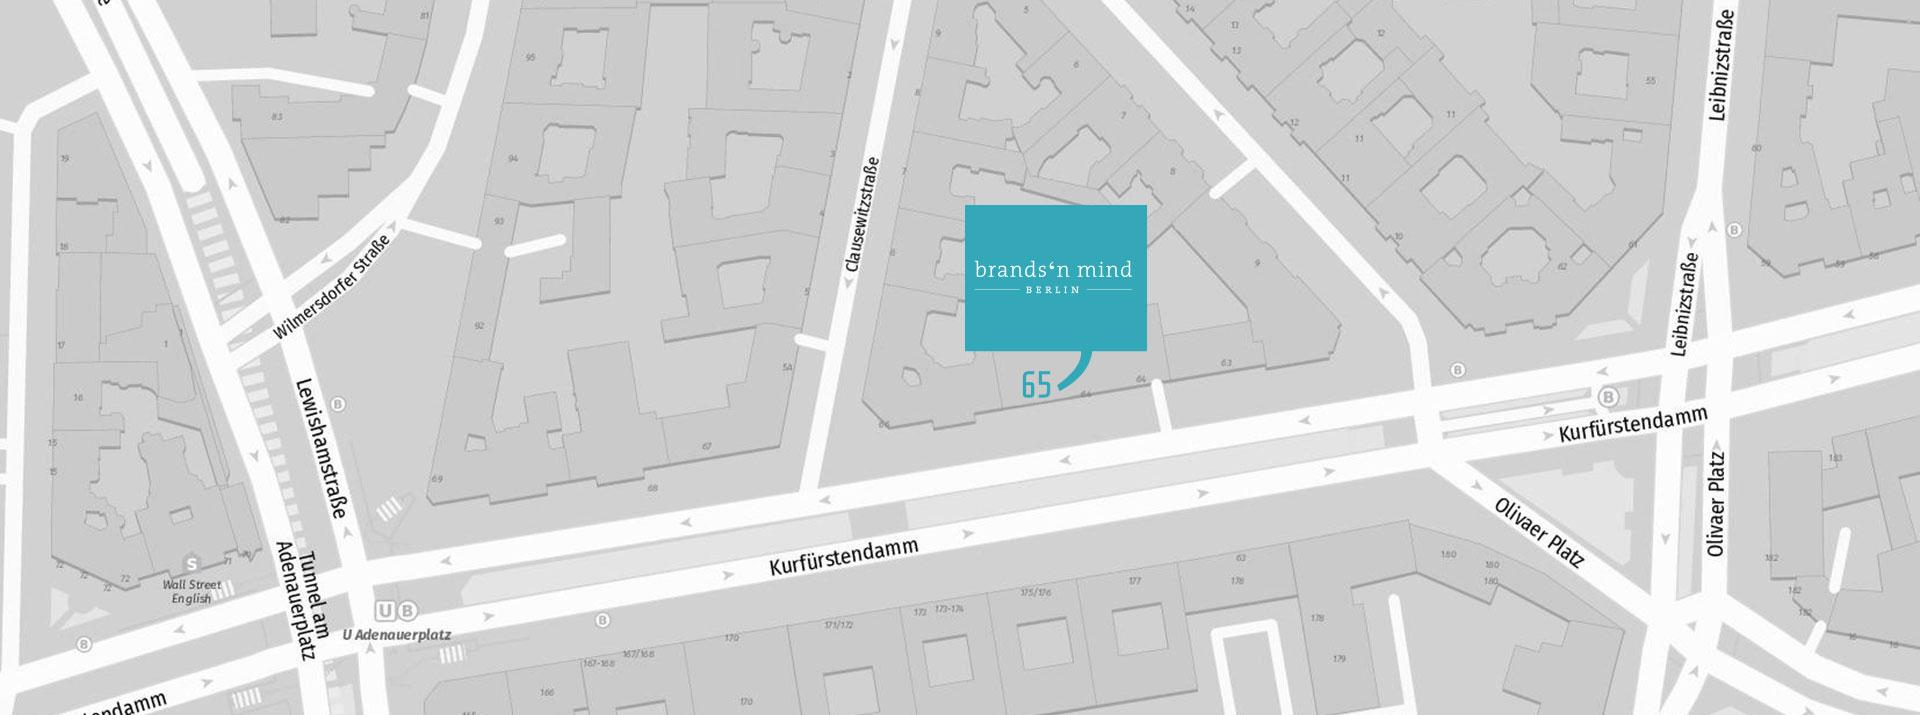 brandsn mind Standort Karte Berlin